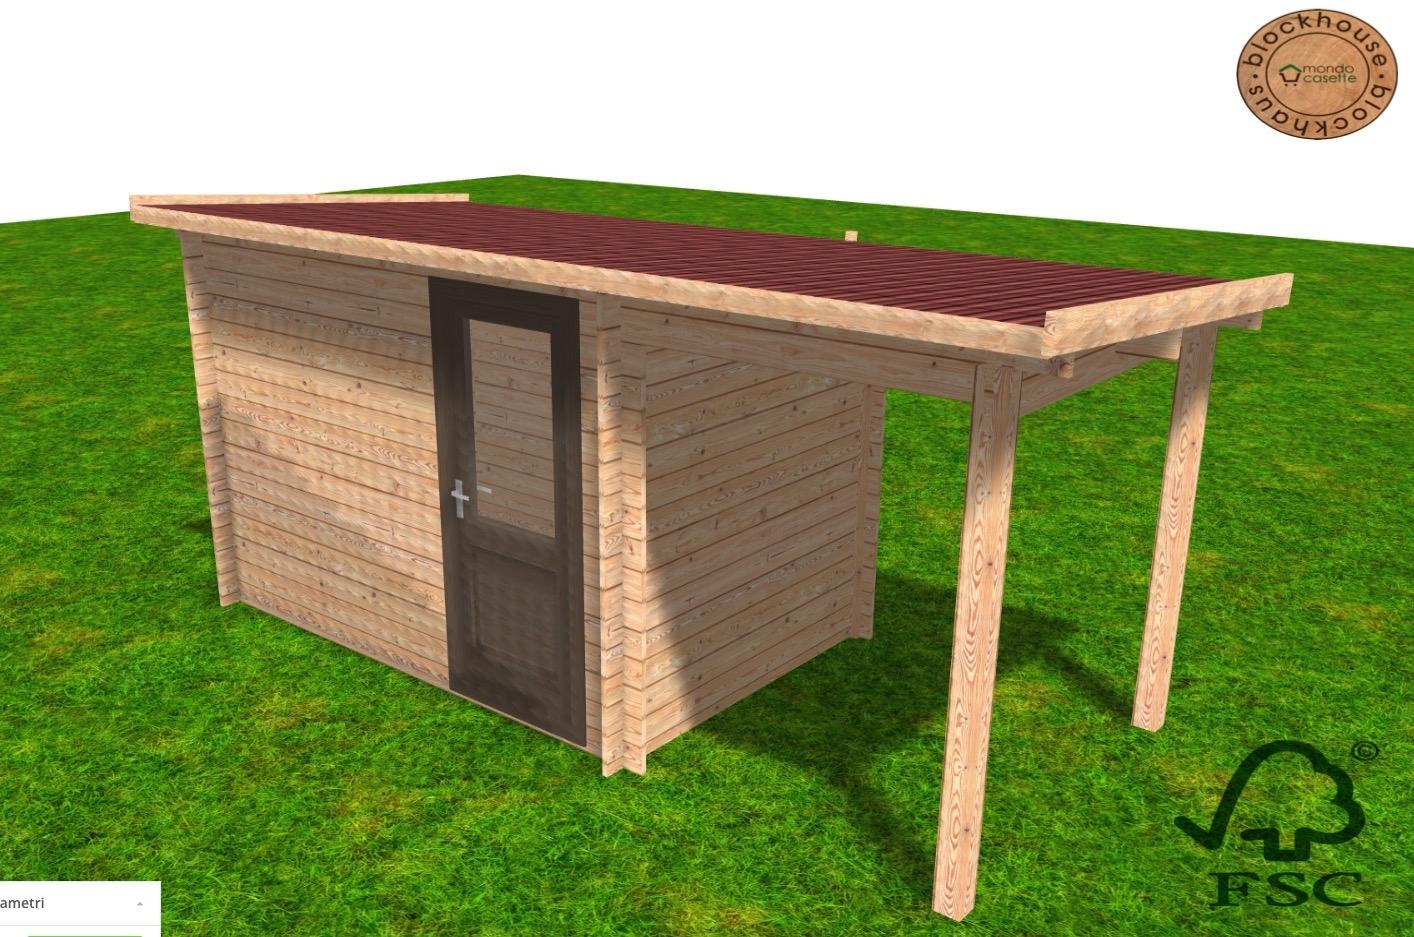 Casetta in legno Pado - 4,5x2 - pareti da 28 mm